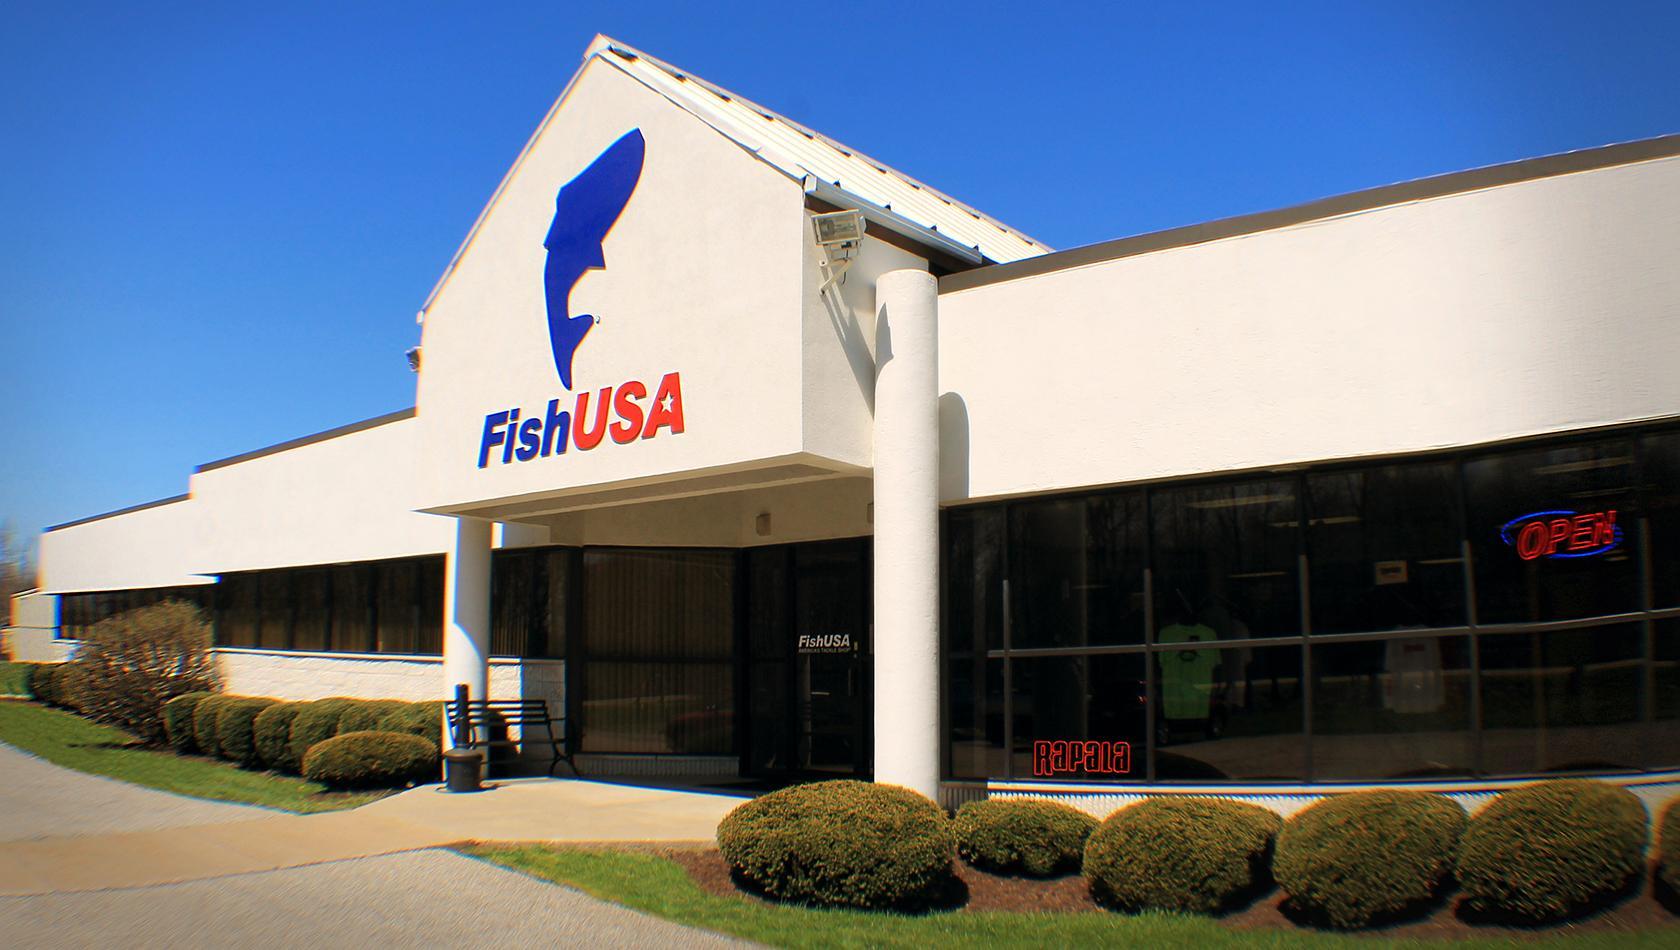 FishUSA in Fairview, PA